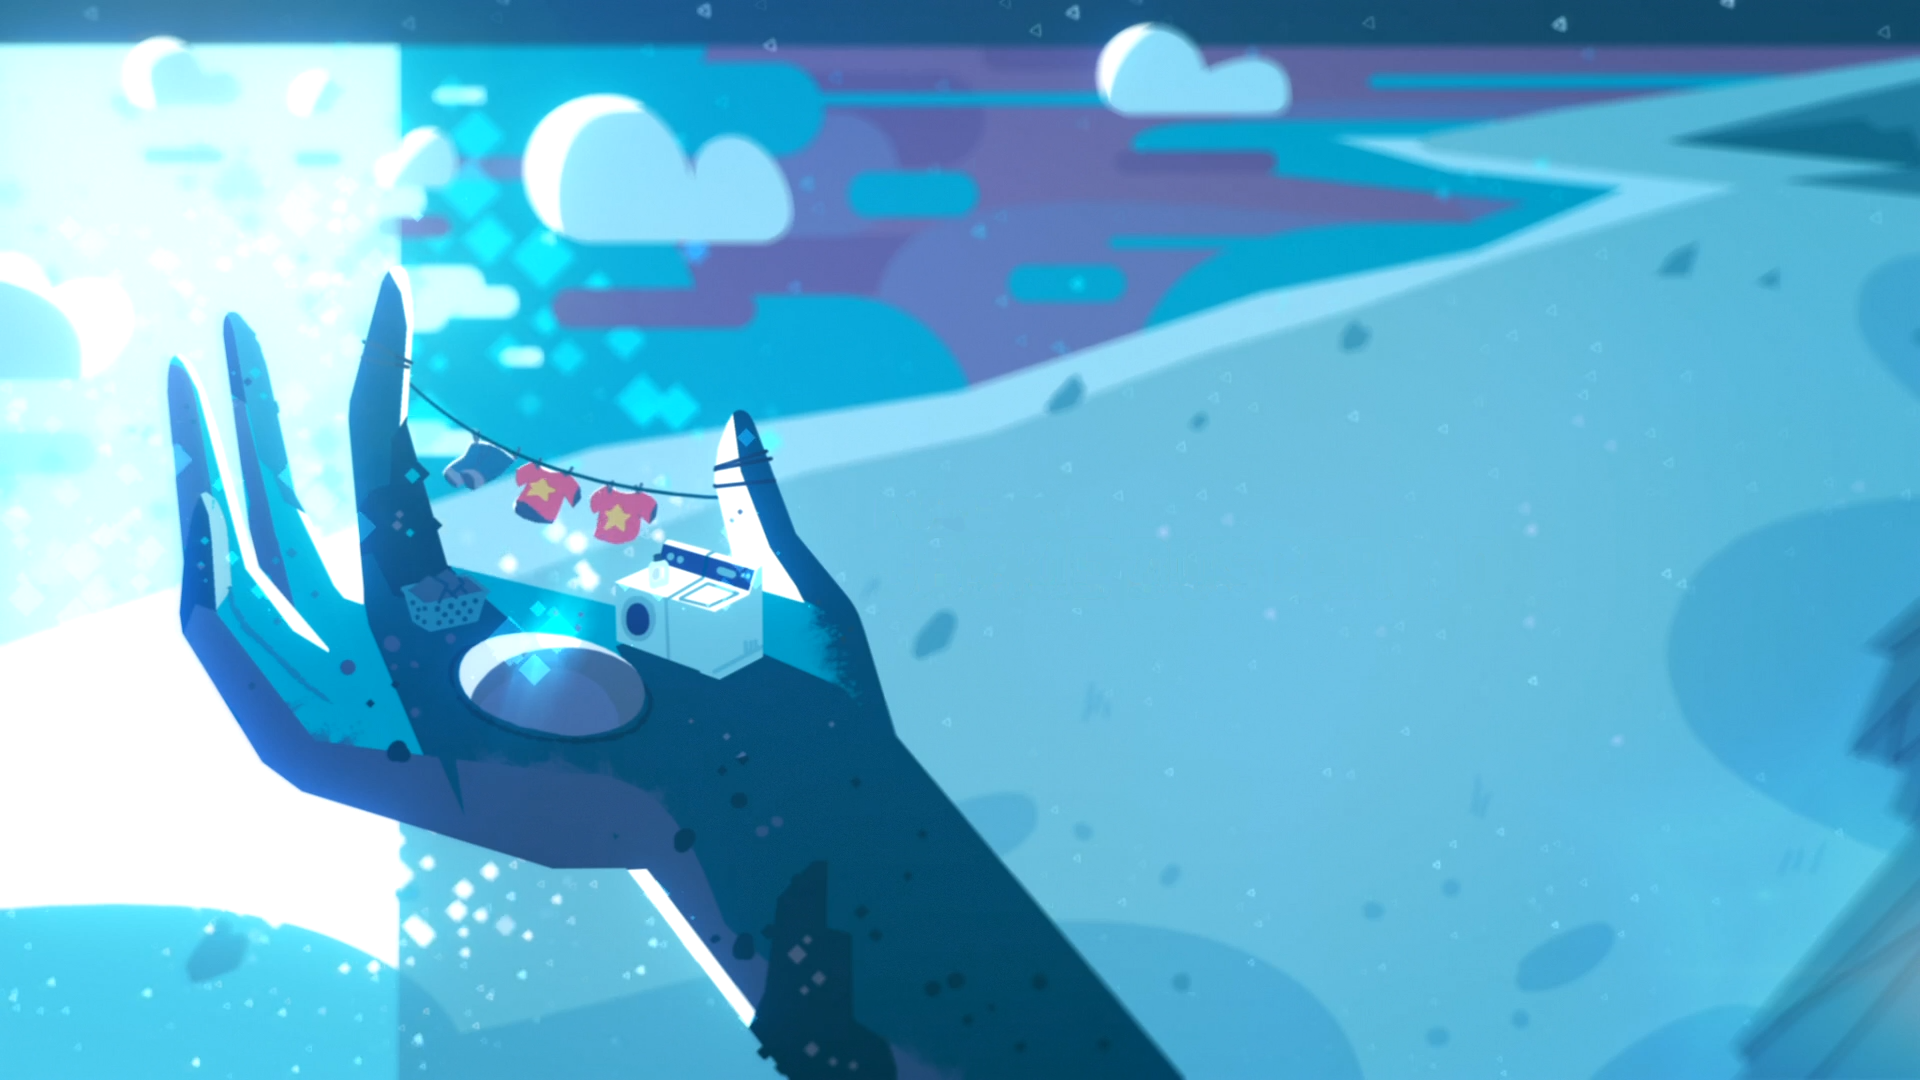 Steven Universe Ending Background Fondo De Pantalla Hd